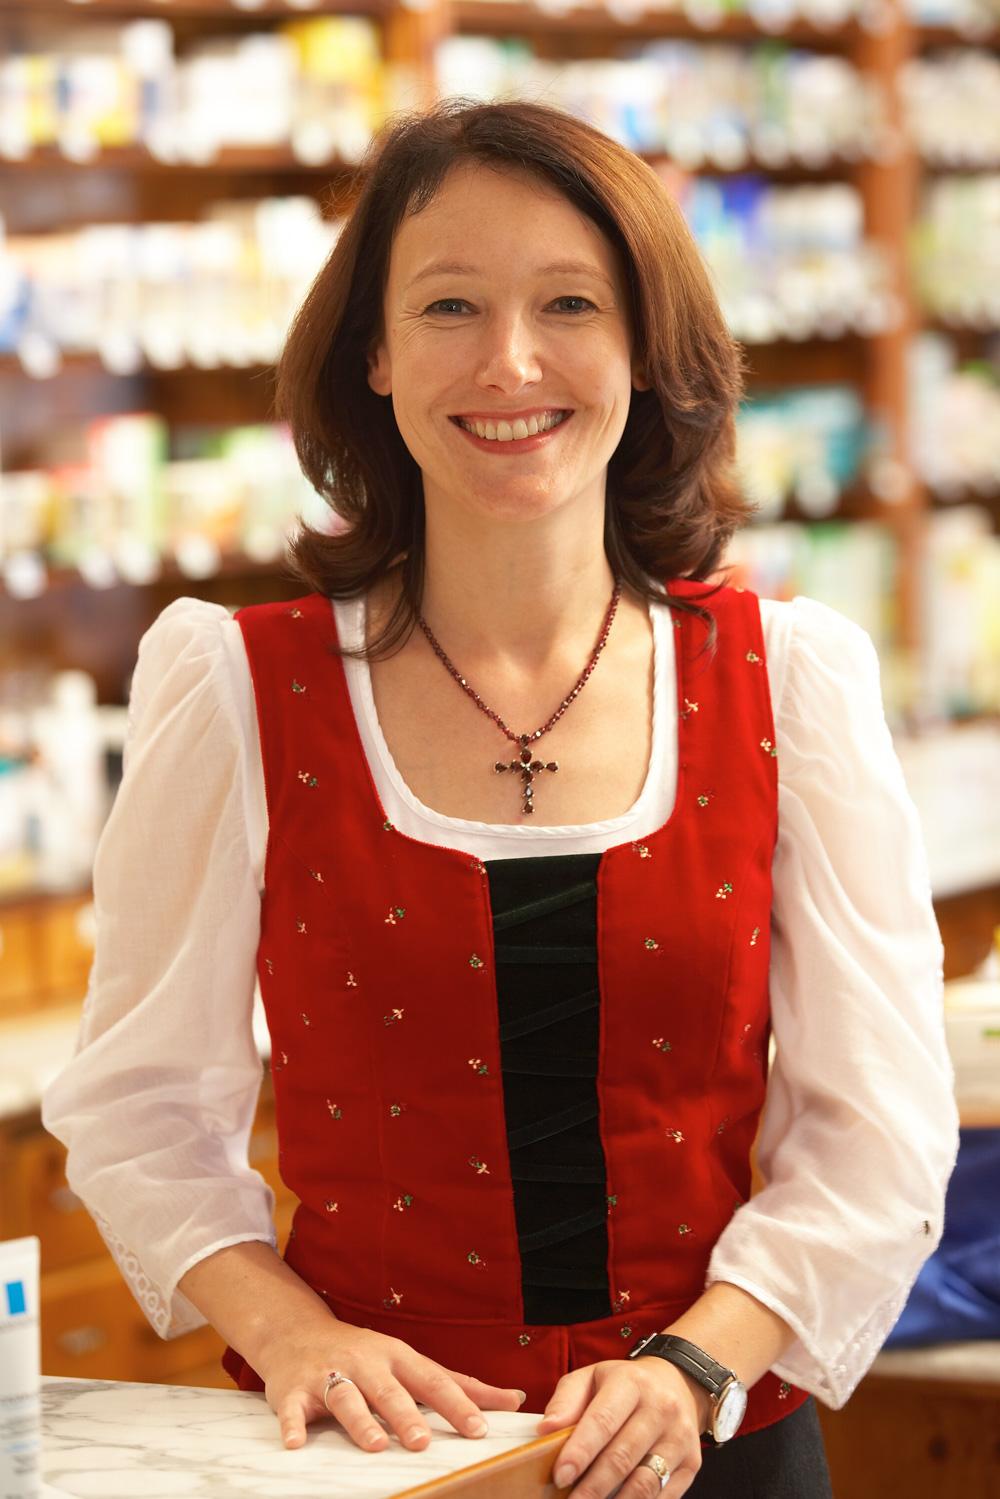 Dr-Angelika-Prentner_Apotheke-Mariazell